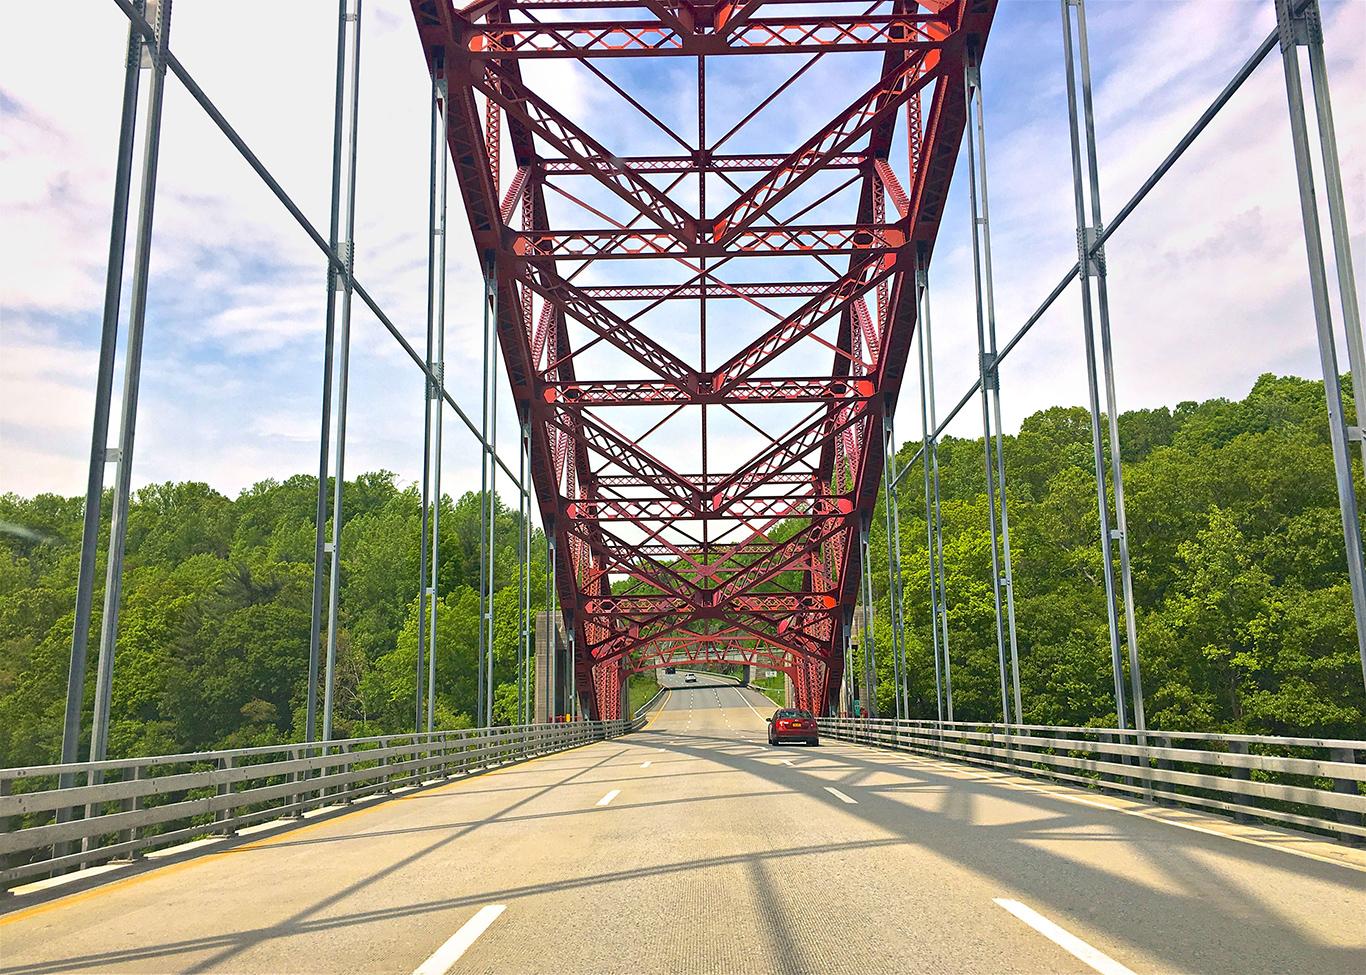 amvets bridge taconic parkway